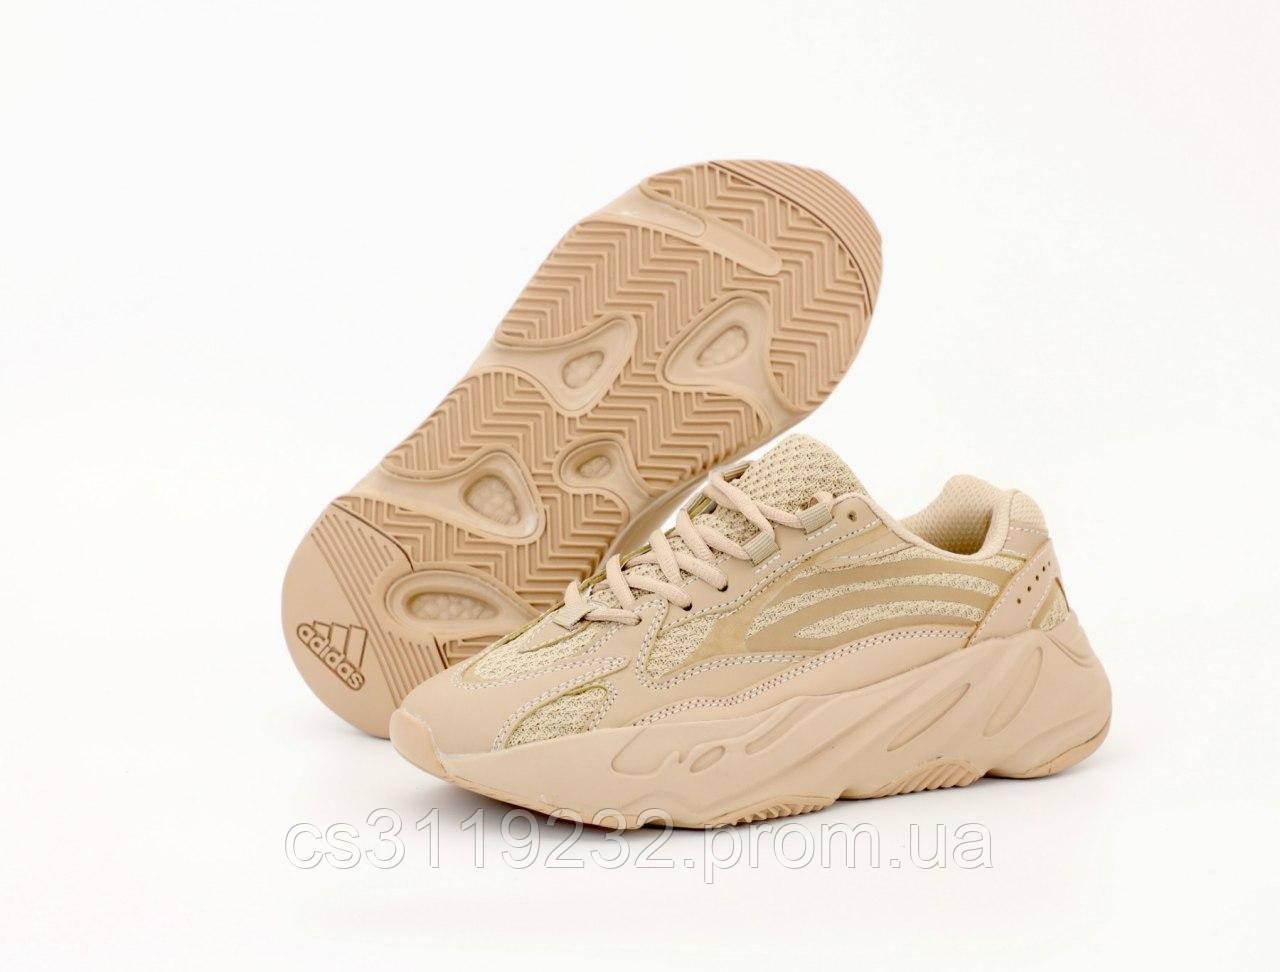 Женские кроссовки Adidas Yeezy Boost 700 Reflective Beige (бежевые)